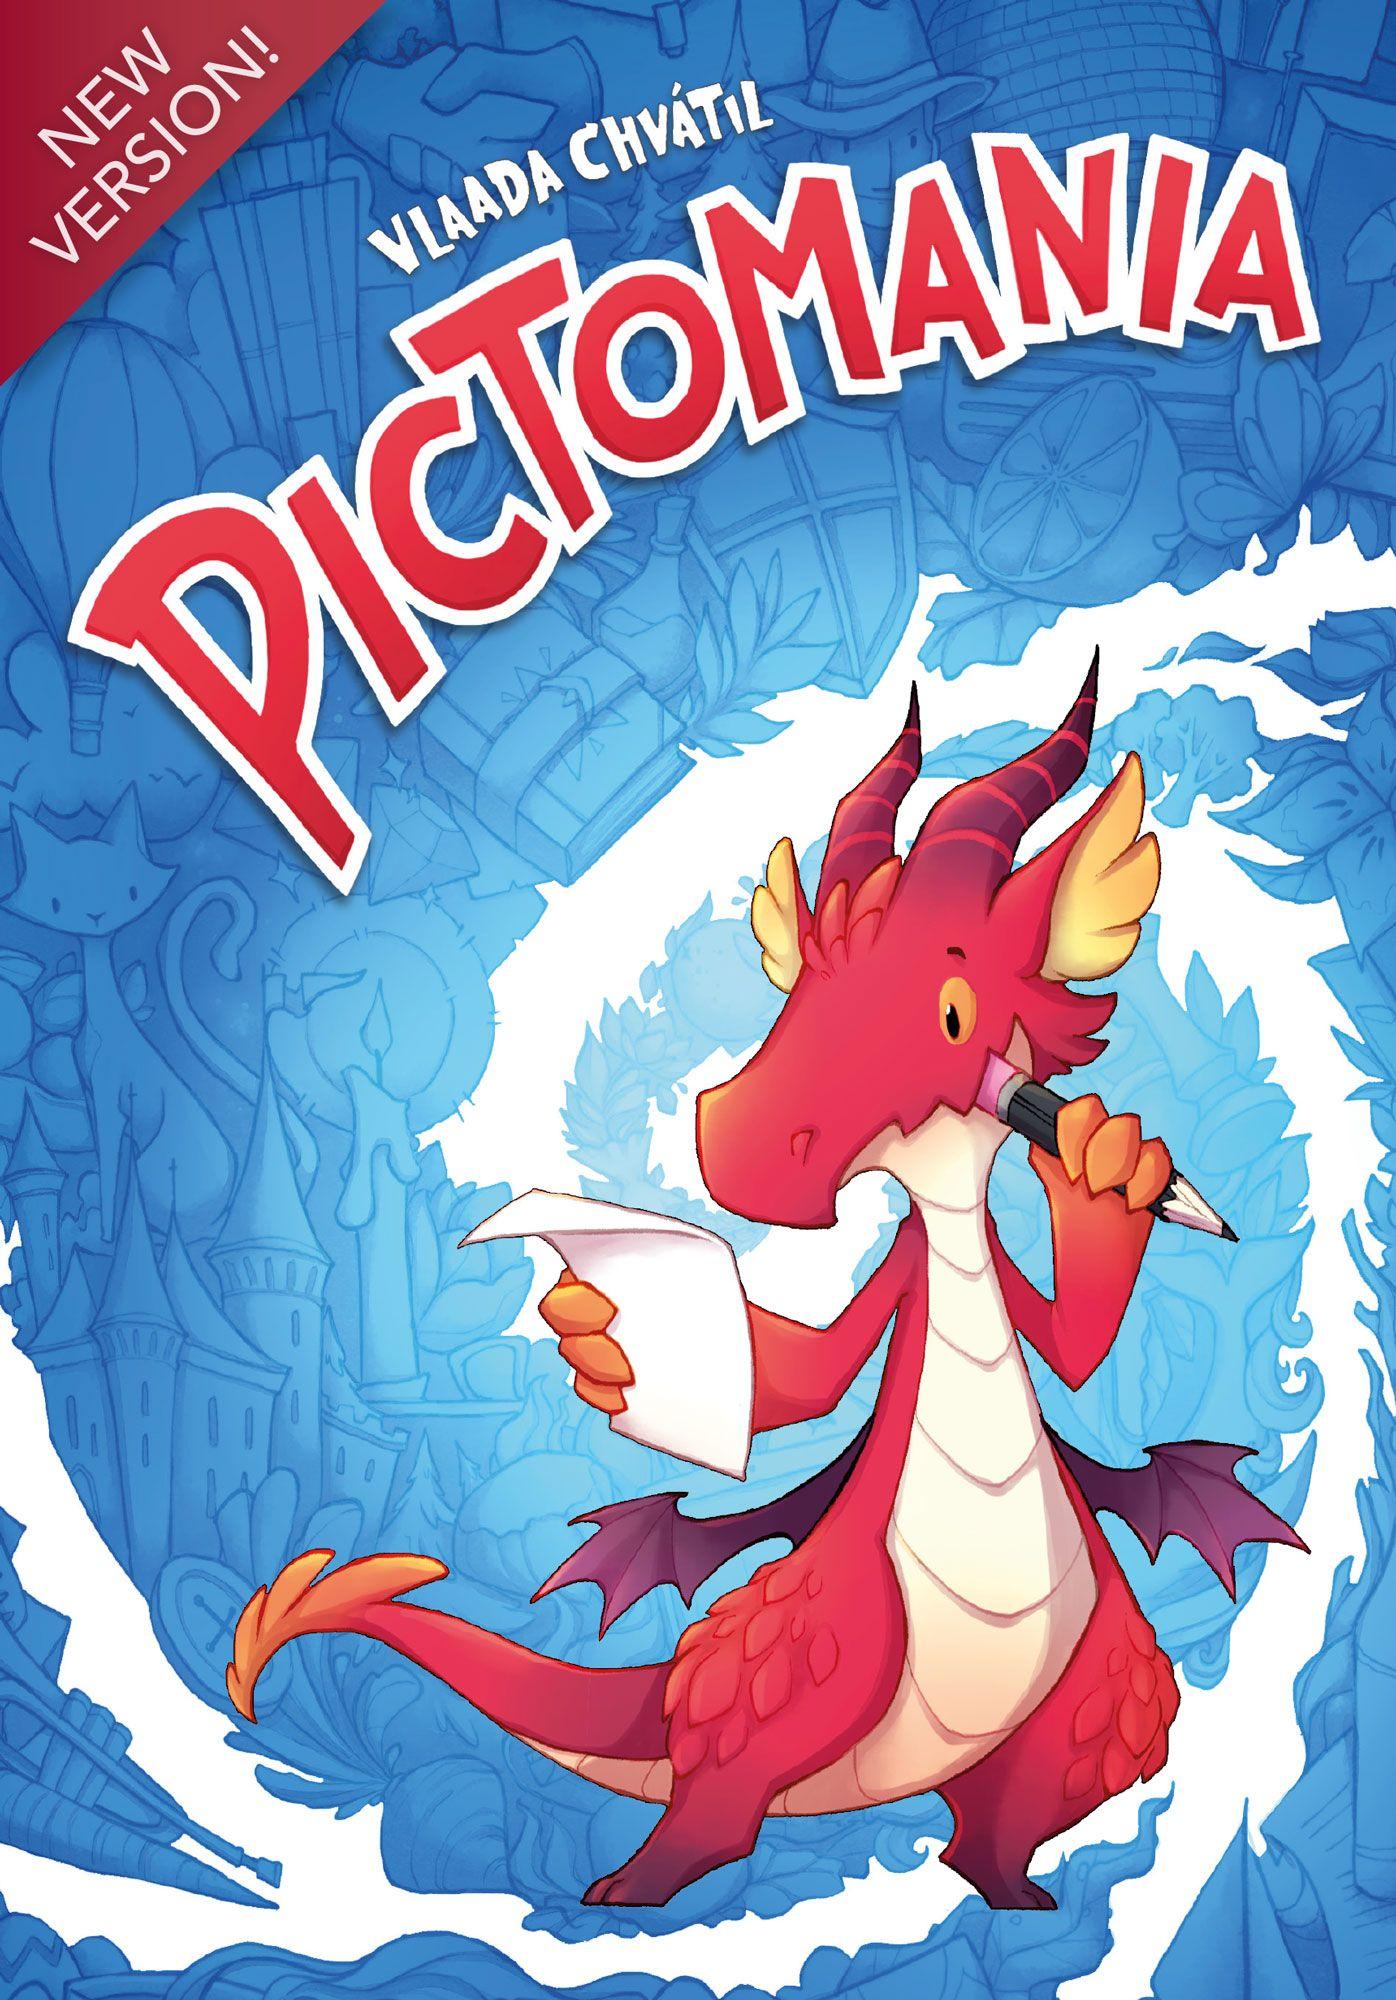 Pictomania (Second Edition)